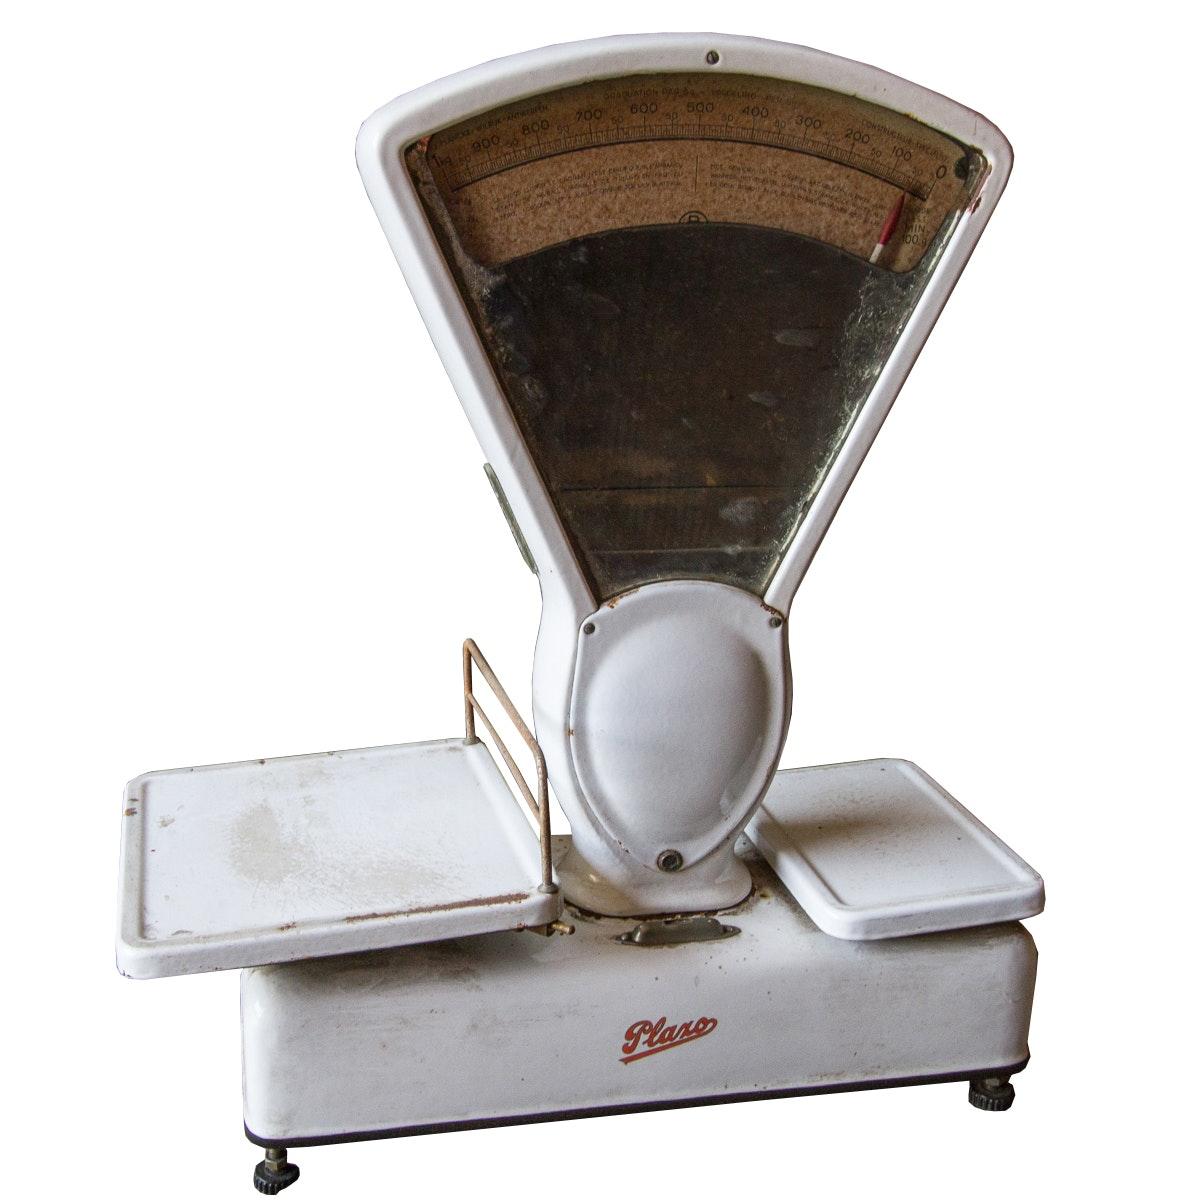 Vintage White Plaxo Deli Scale